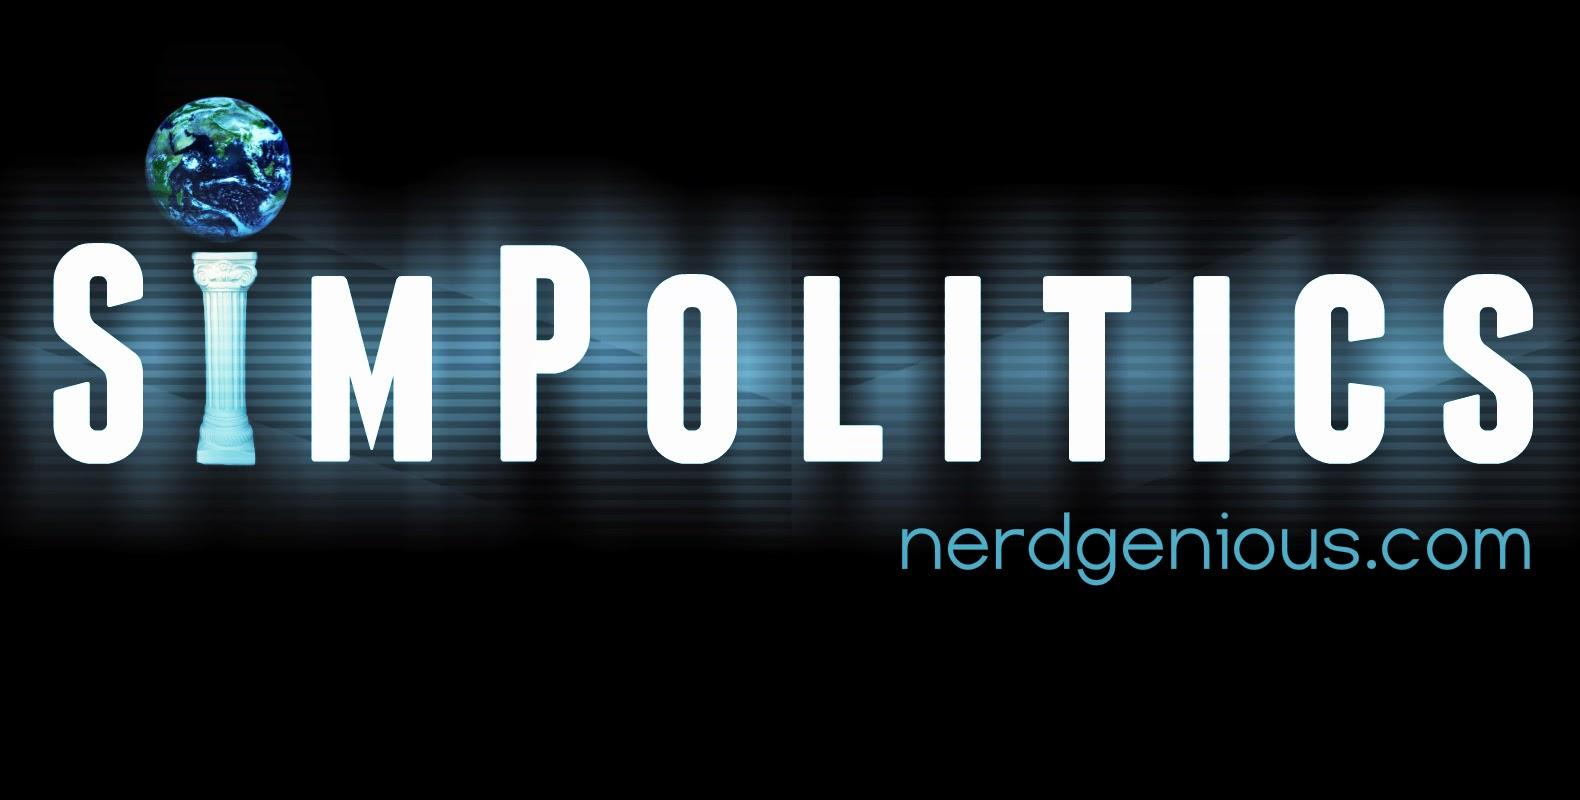 Simpolitics: Remember This 5th November